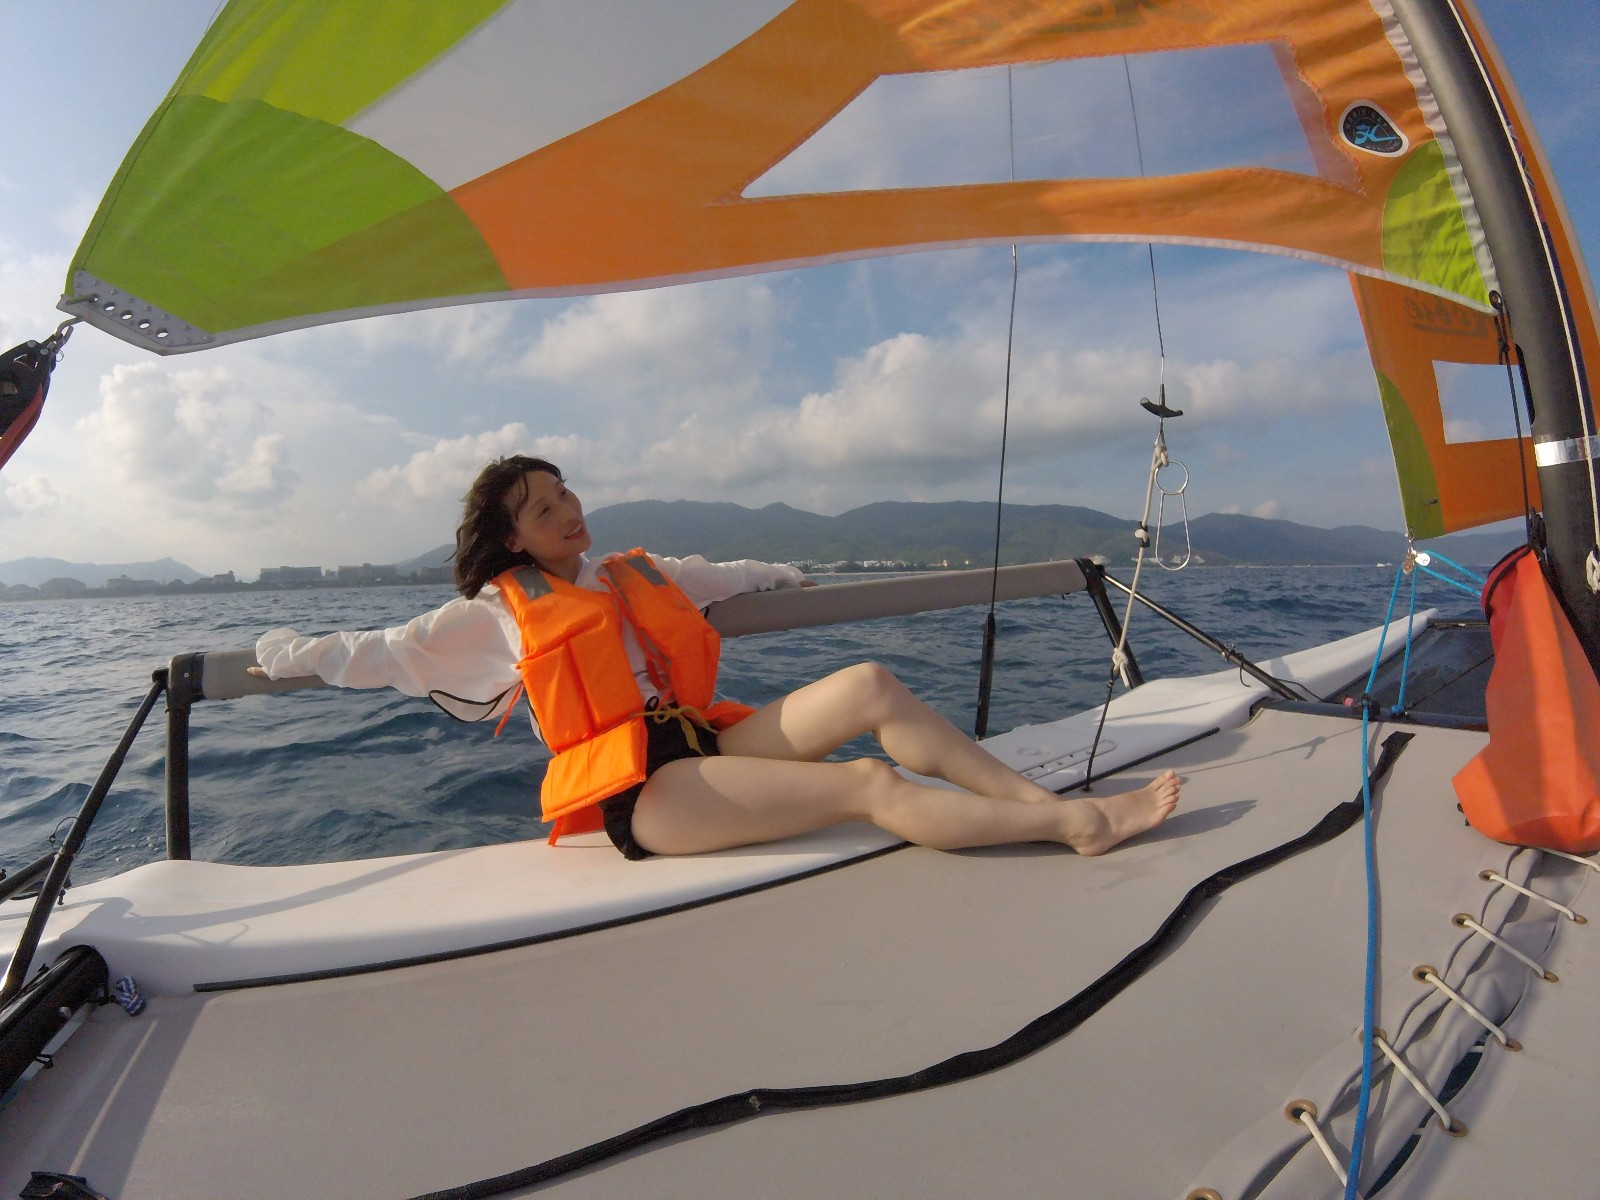 hobie getaway全新现货双体帆船 可休闲自己玩可上沙滩带客人满员8人 海边旅....必备